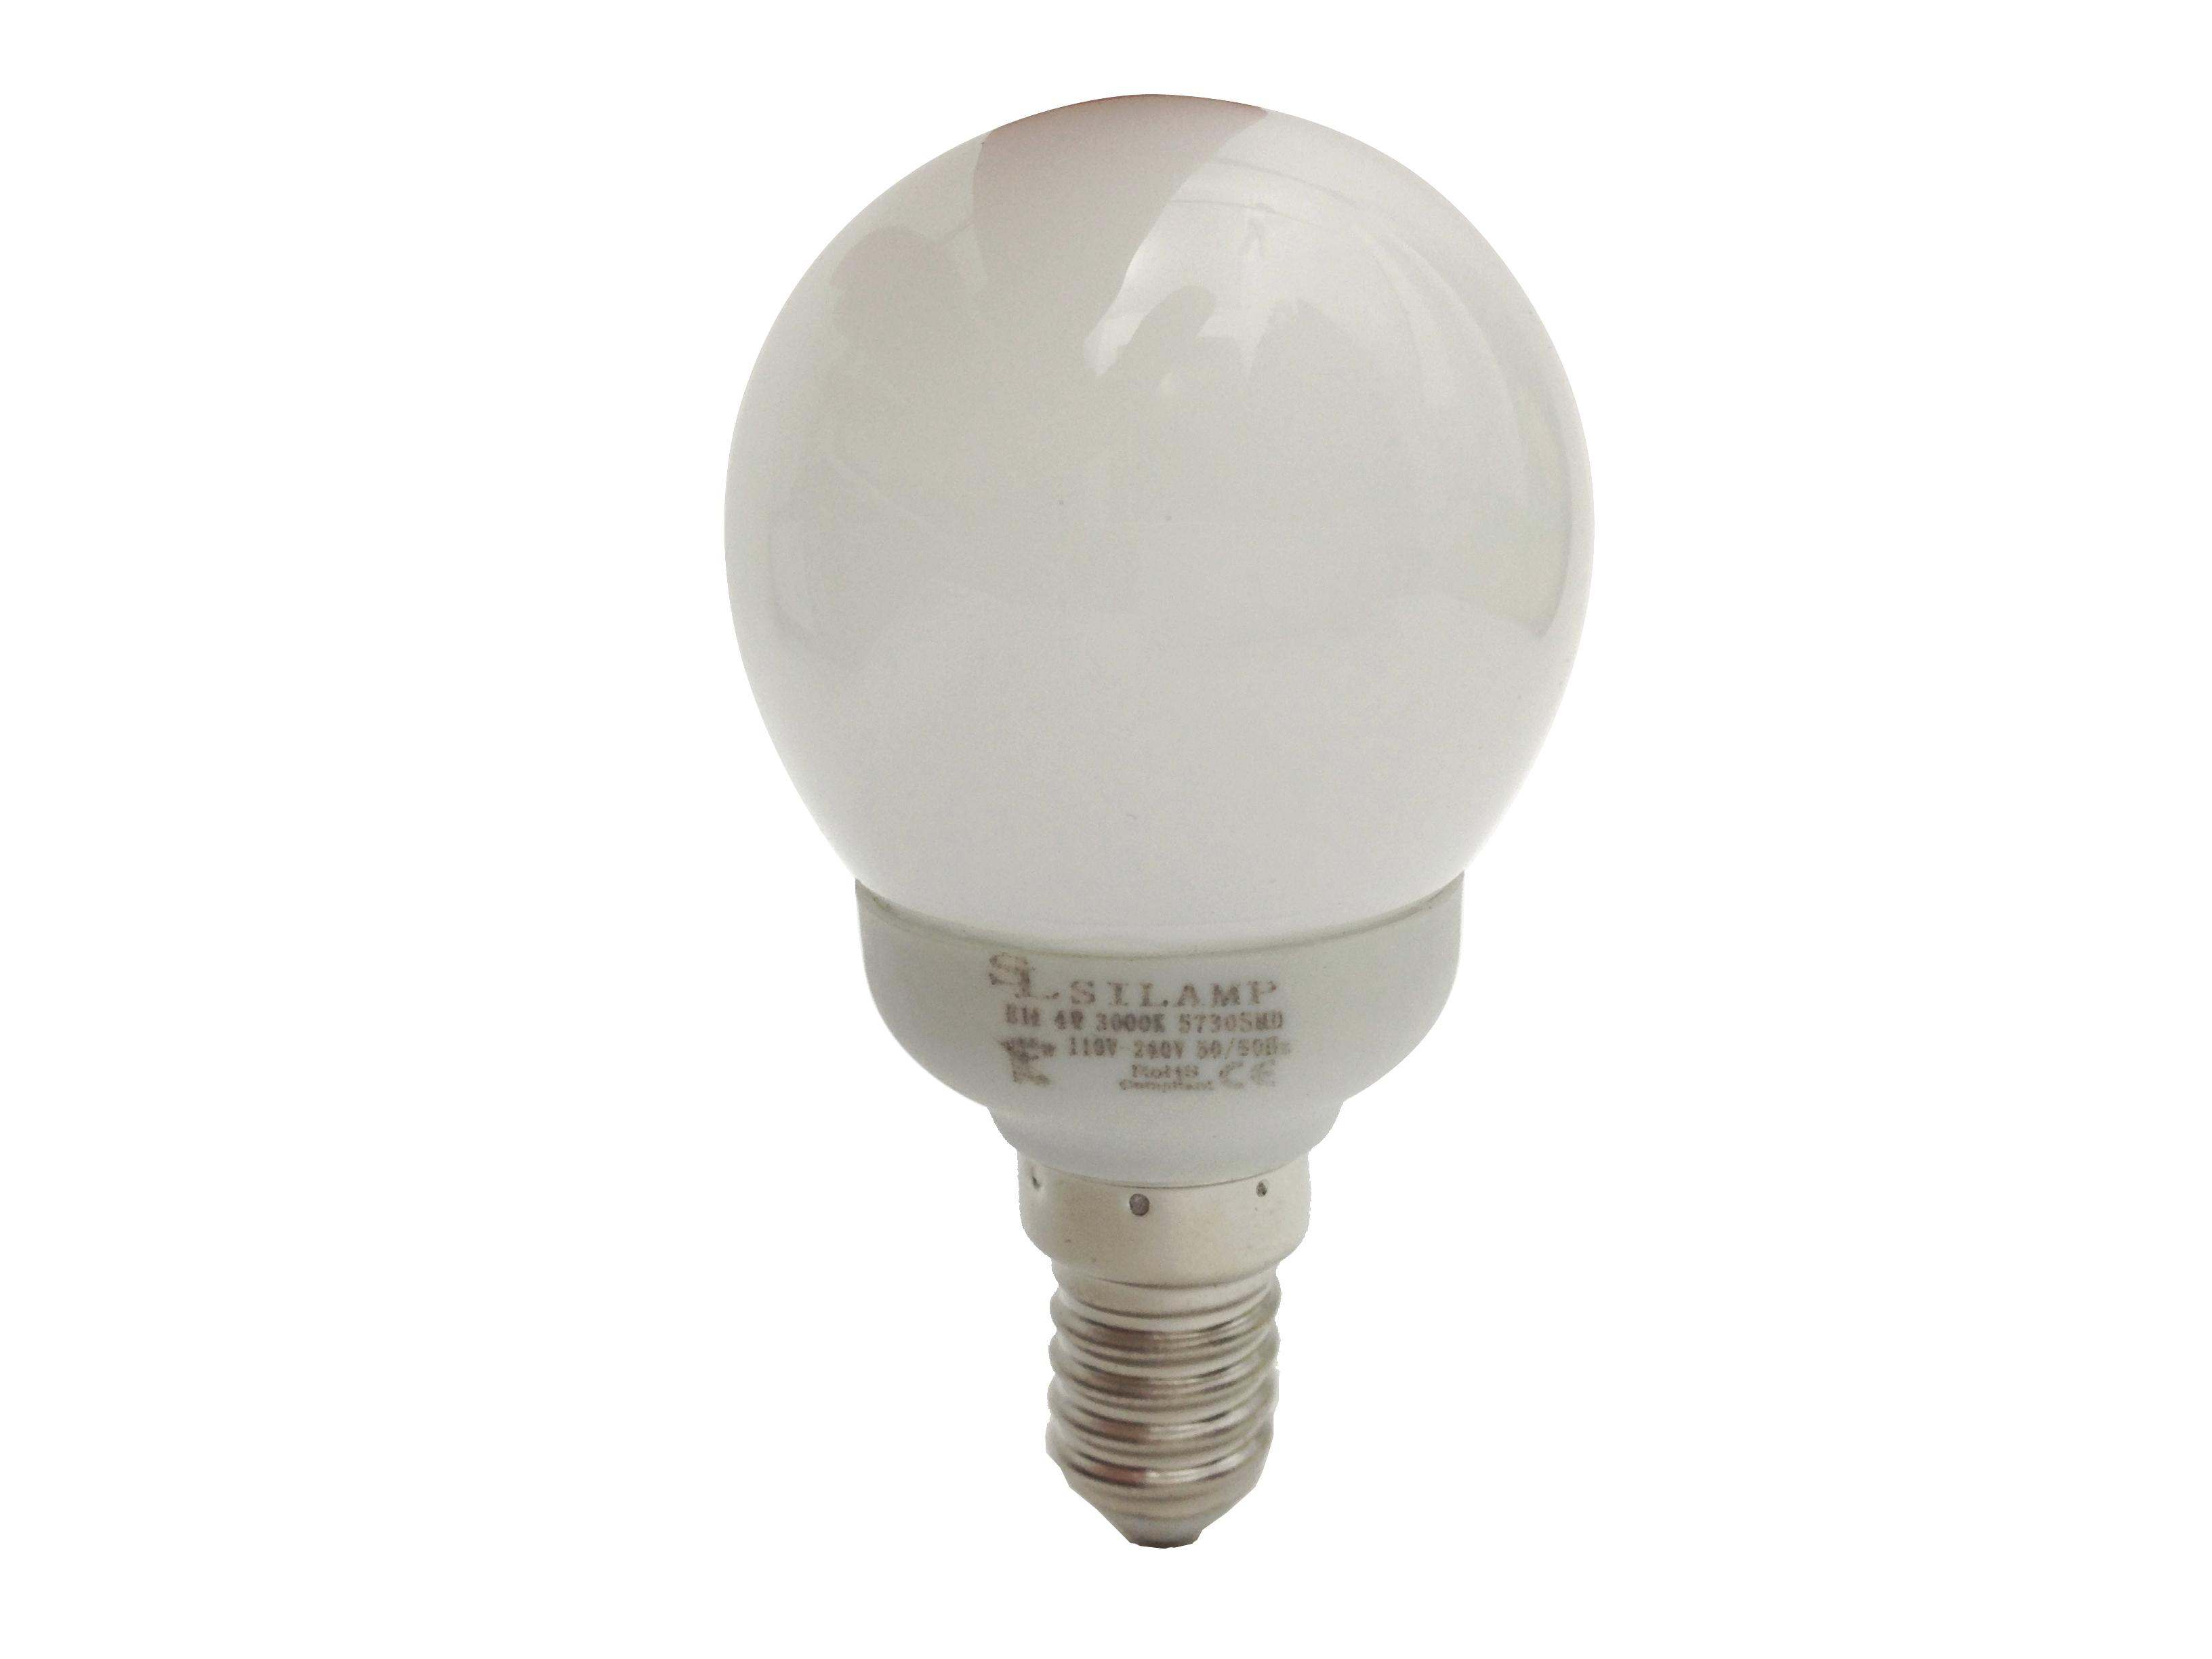 Lampadine Consumo: Gearbest - led lamp g4 ac 220 v lampadine a basso ...